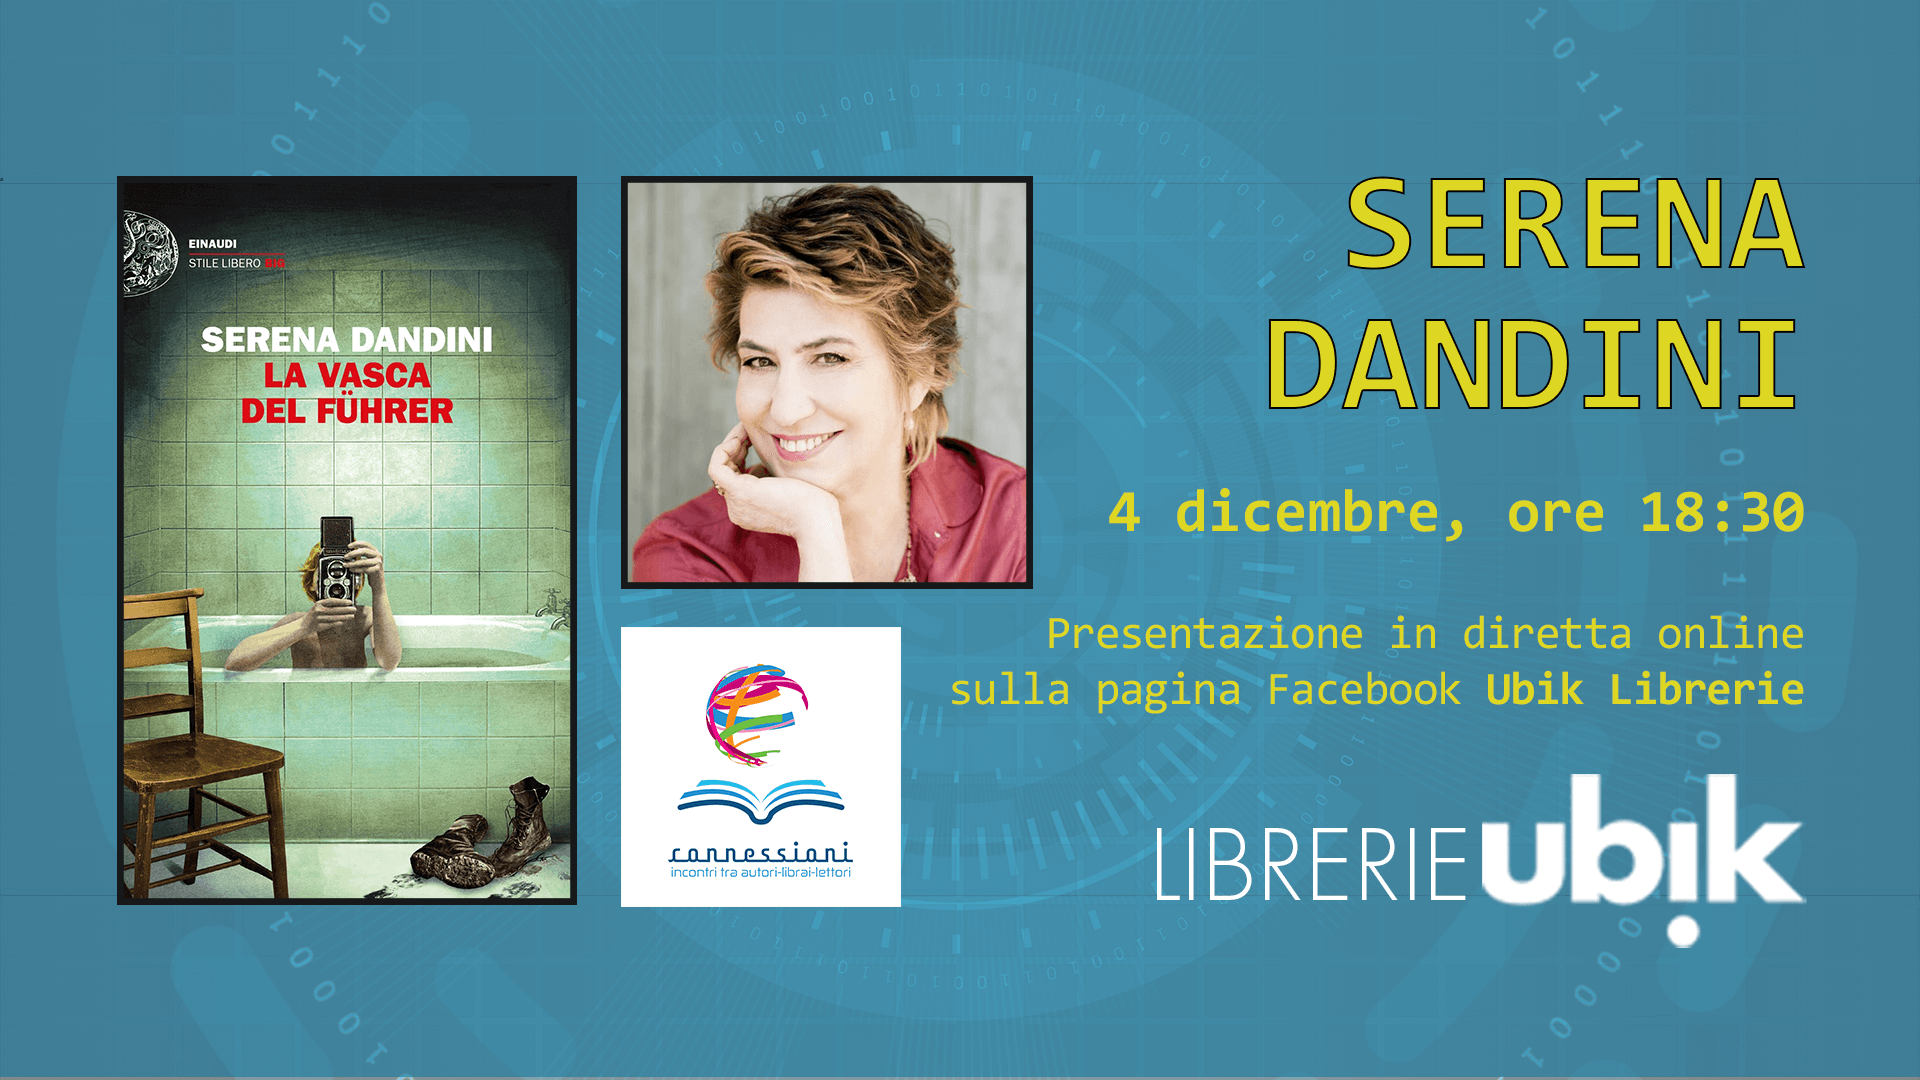 SERENA DANDINI presenta in diretta online